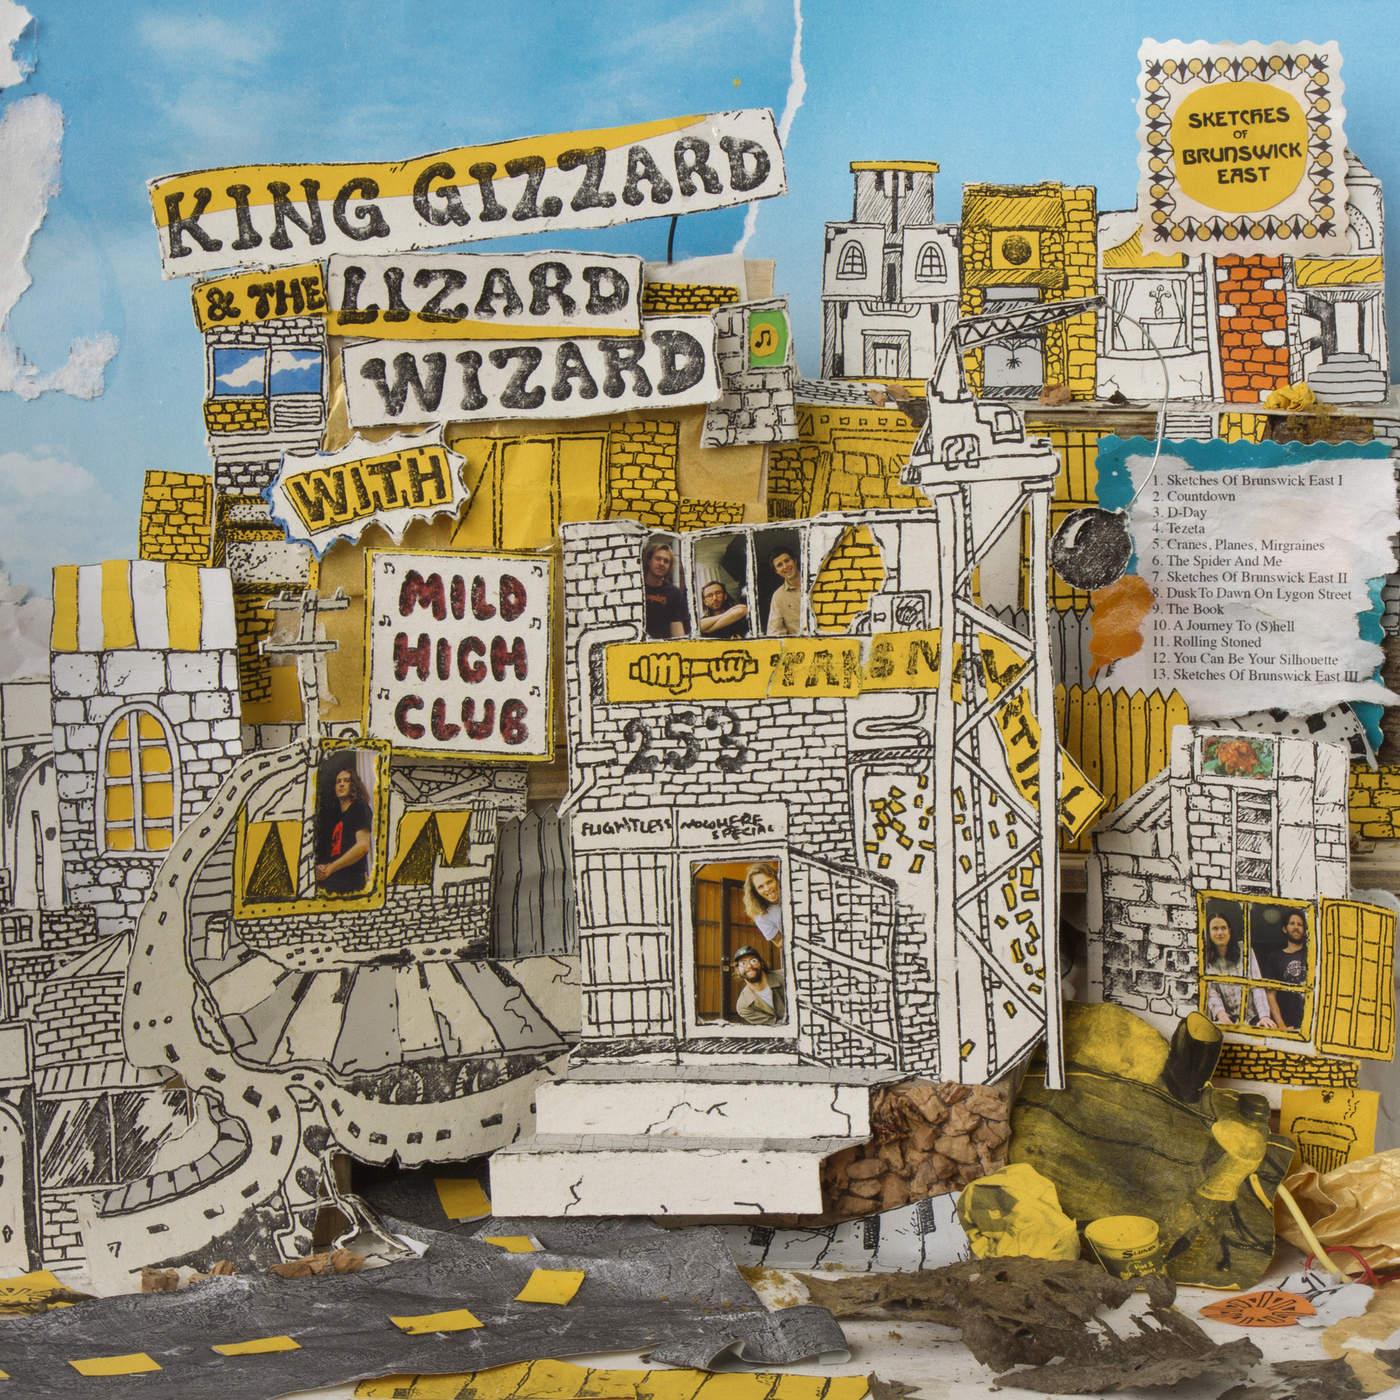 King Gizzard & The Lizard Wizard King Gizzard & The Lizard Wizard. Sketches Of Brunswick East автокресло gb idan lizard khaki